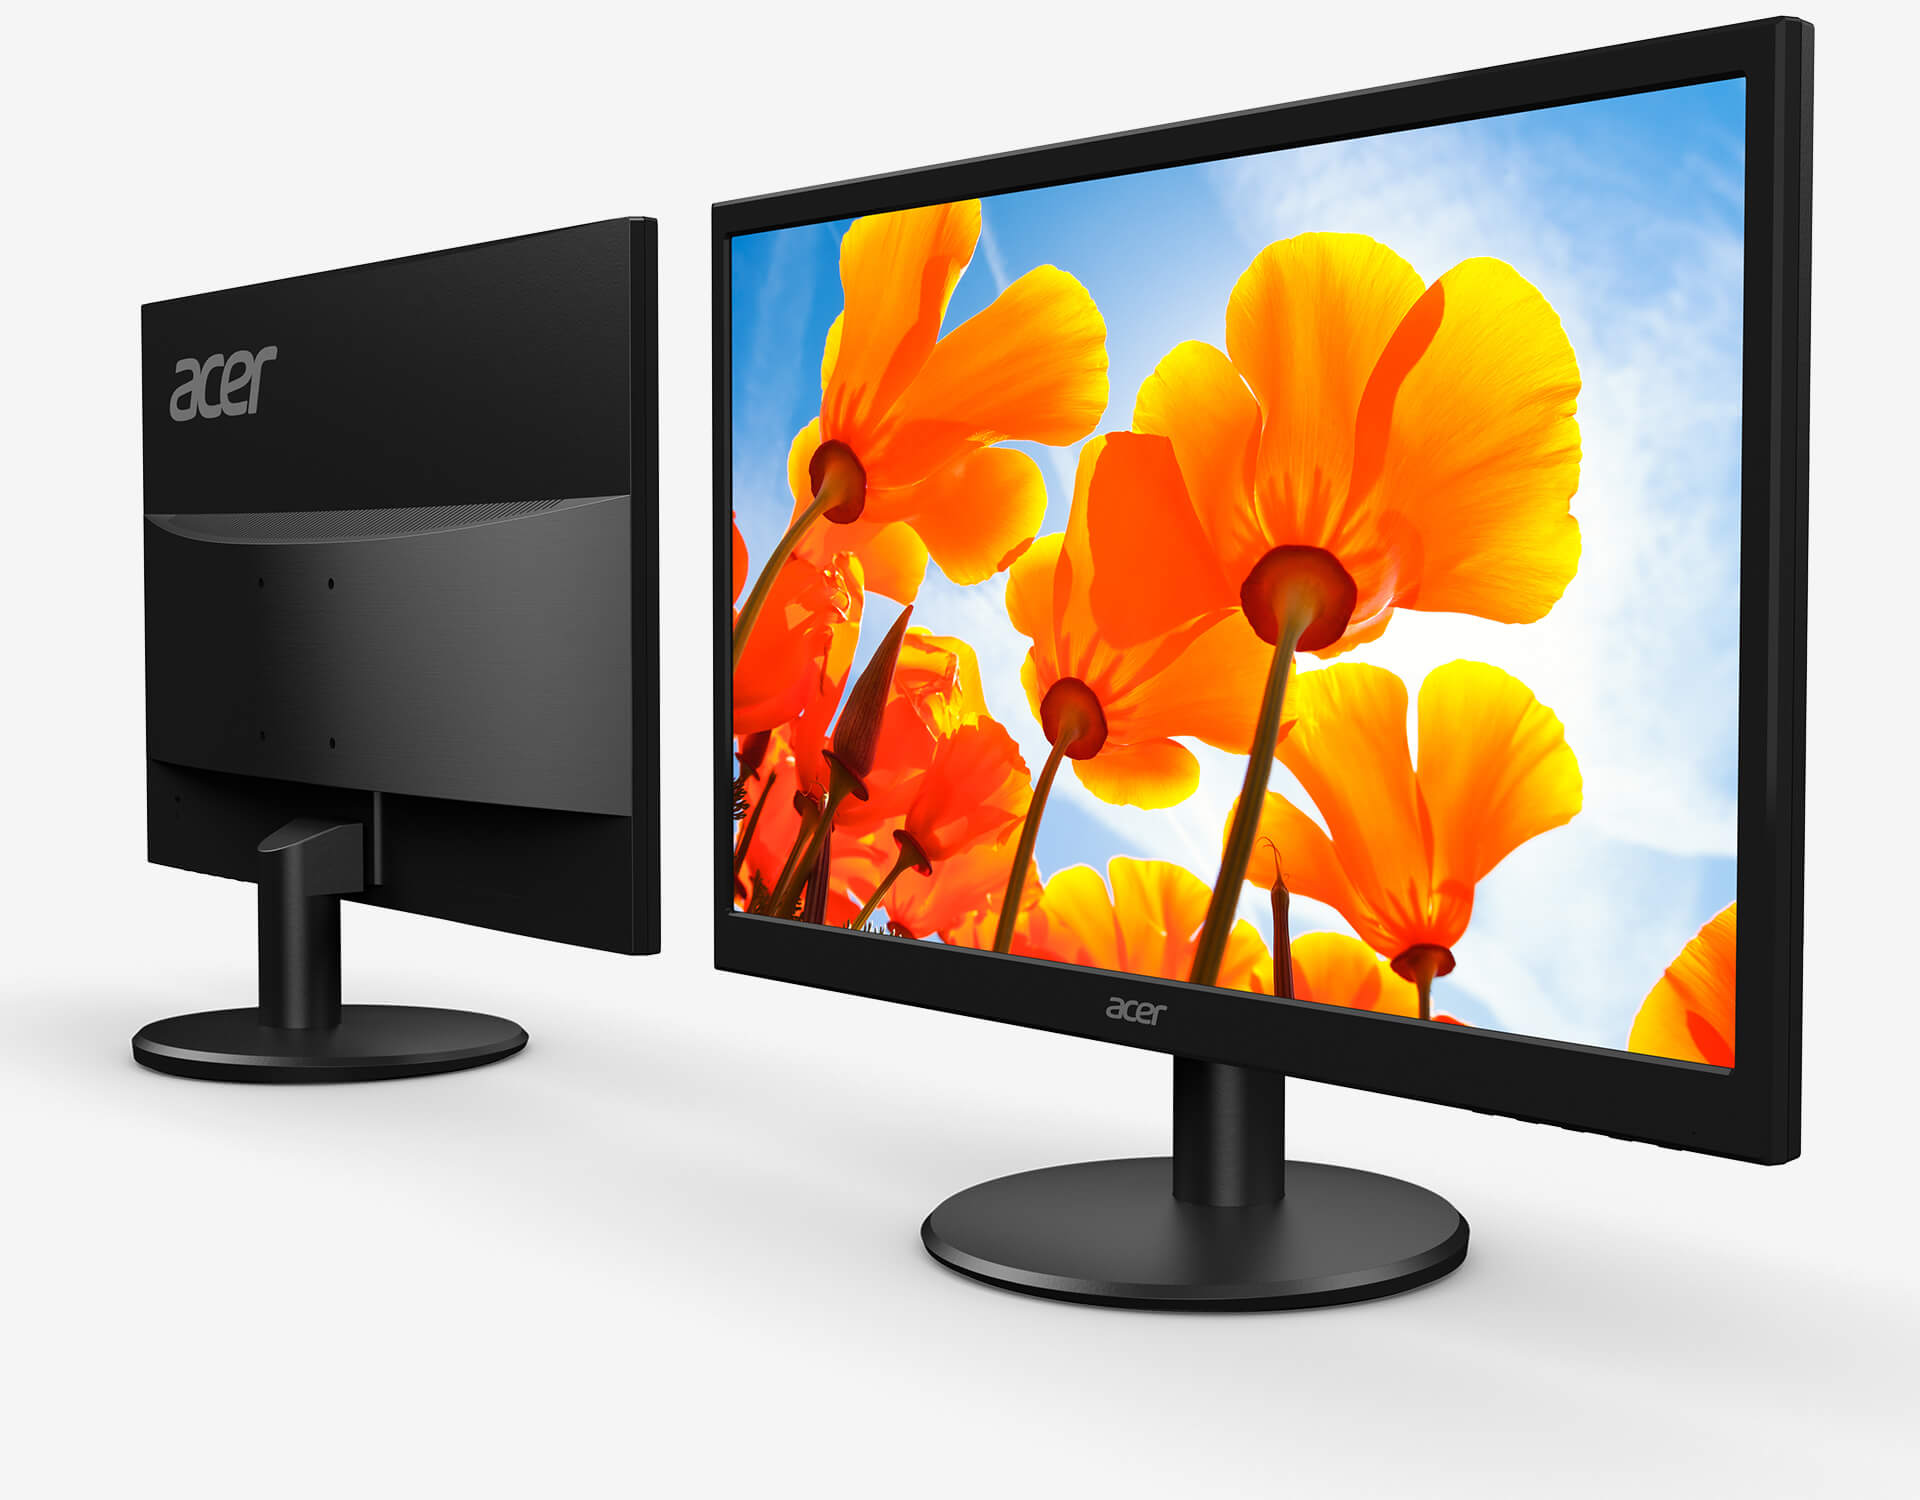 Acer EB2 - overview design - Large